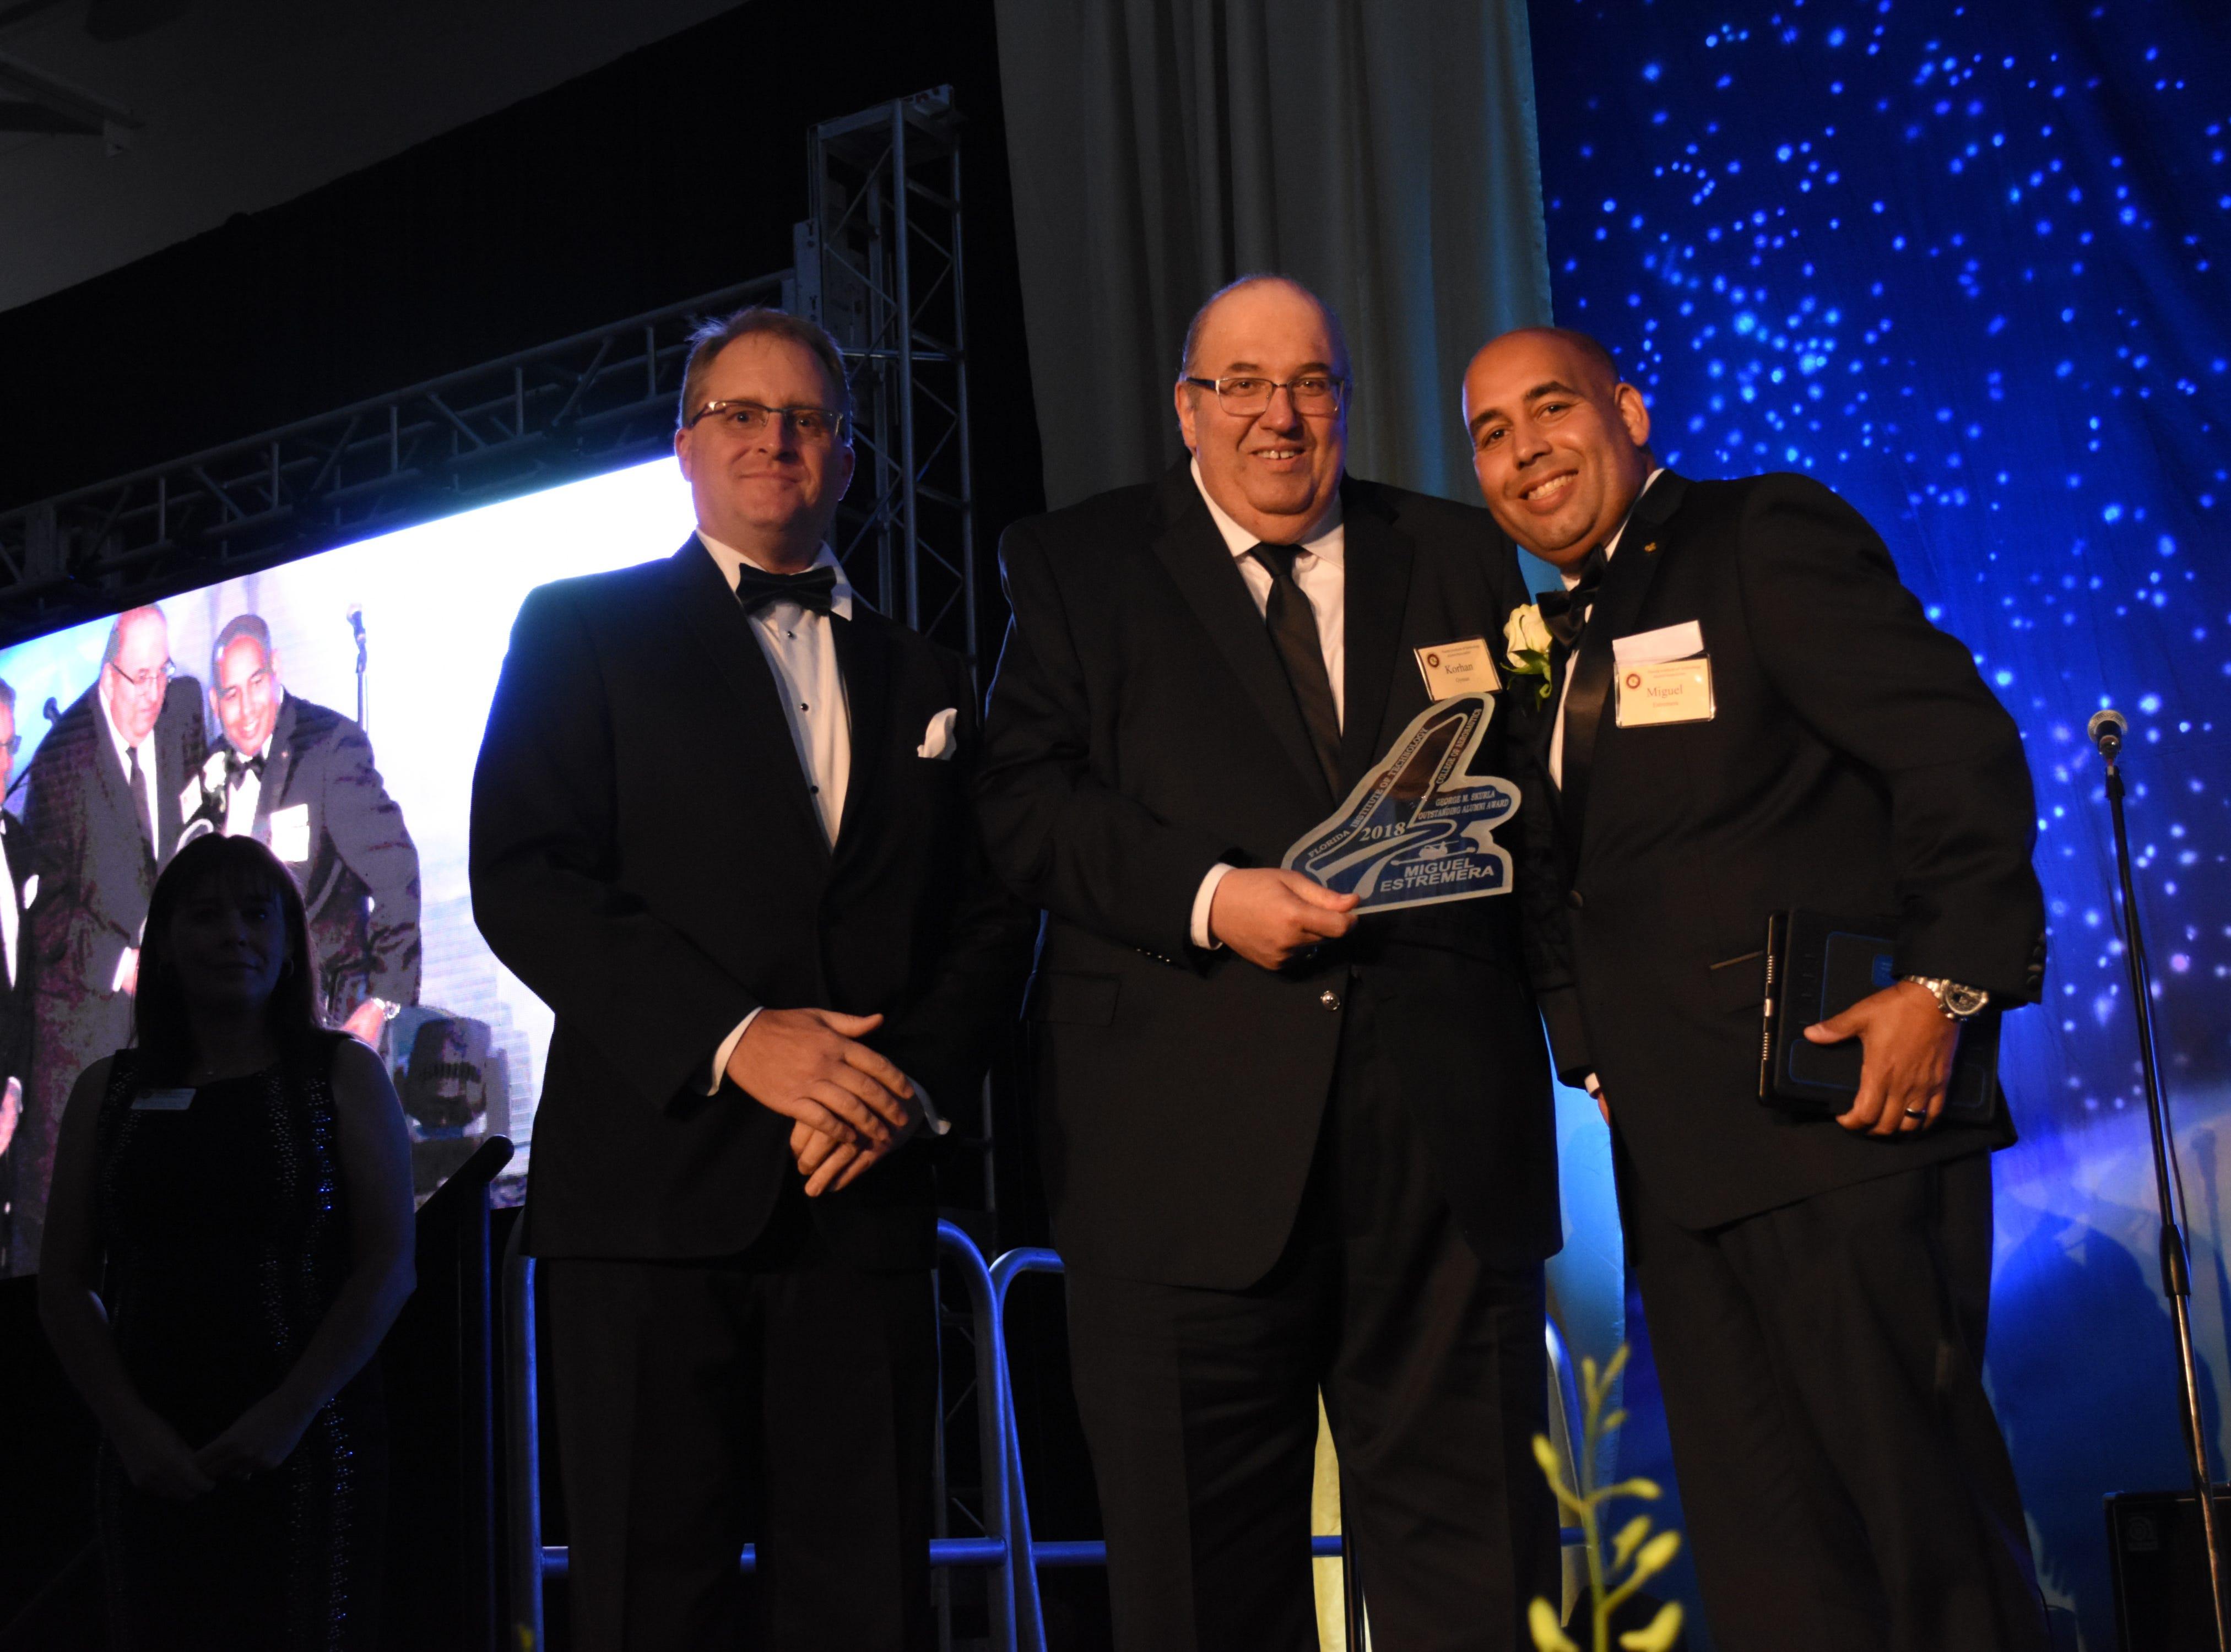 Florida Tech aeronautics dean Korhan Oyman presents Miguel Estremera the Skurla award at Florida Tech's 60th Anniversary Homecoming Gala Oct. 13, 2018, at the Clemente Center.